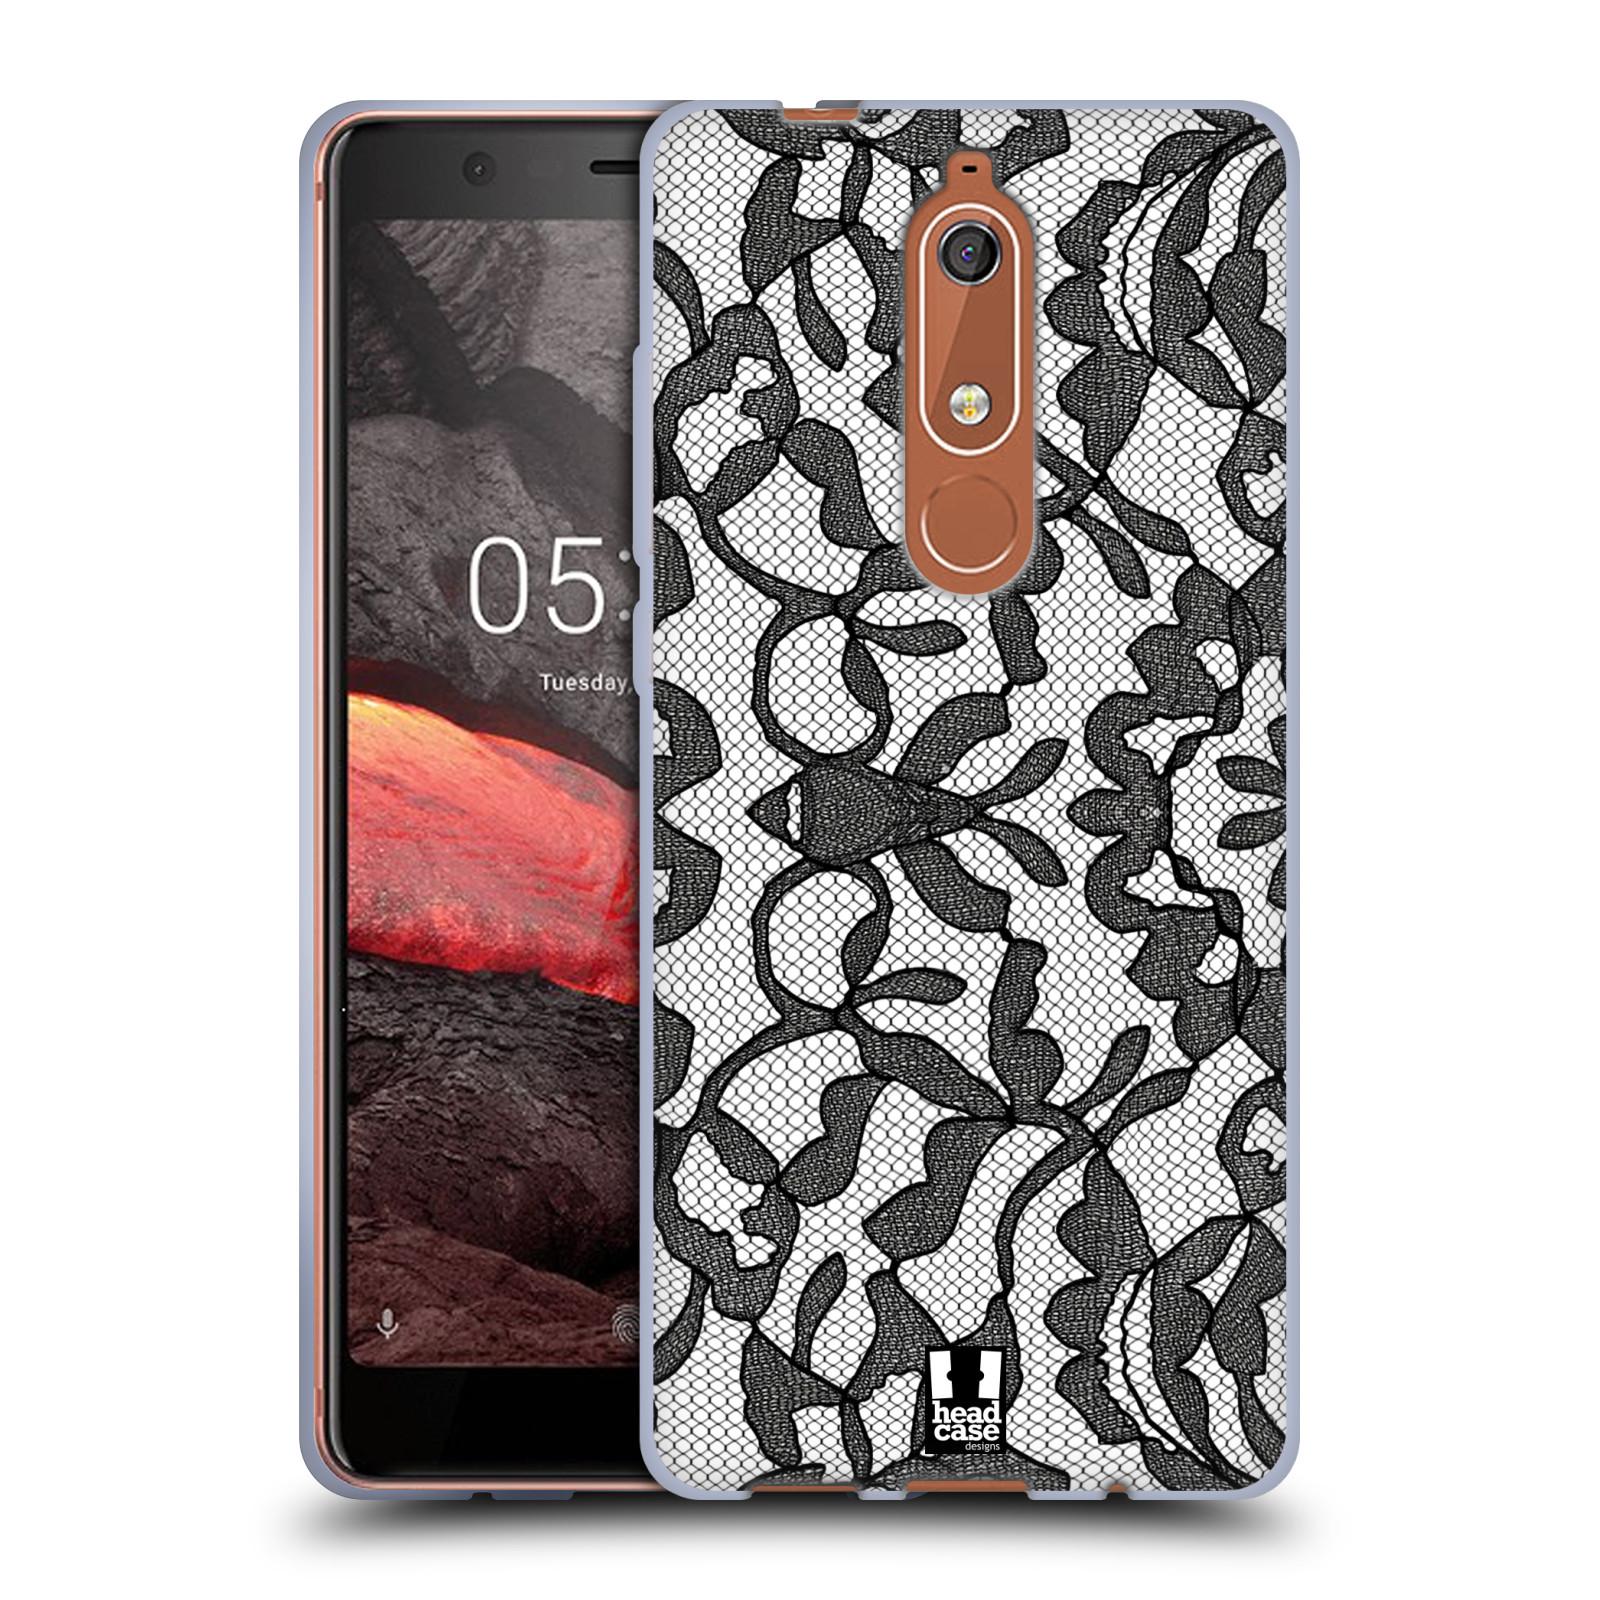 Silikonové pouzdro na mobil Nokia 5.1 - Head Case - LEAFY KRAJKA